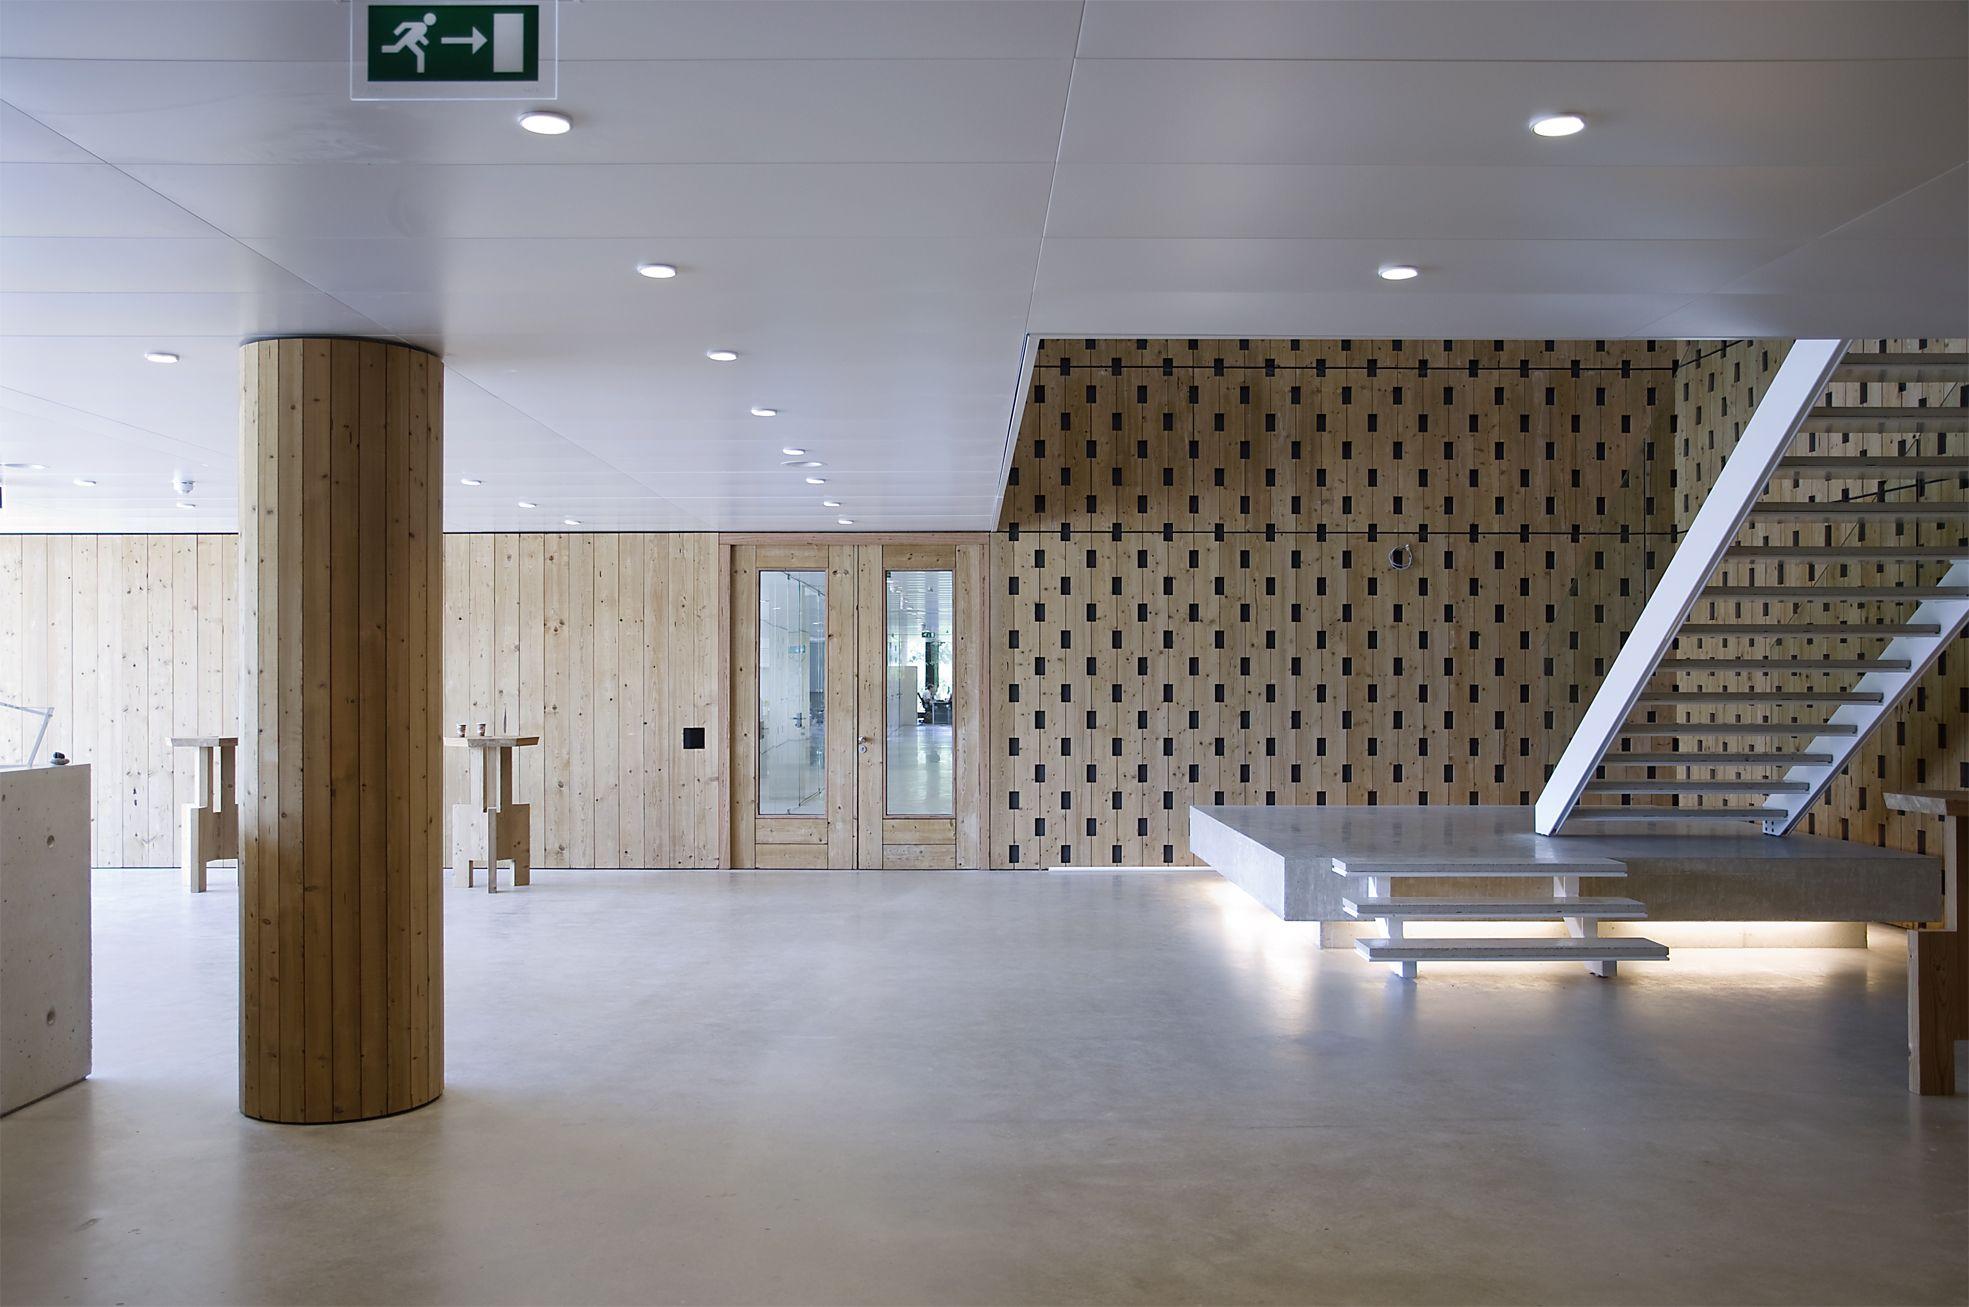 Nioo knaw wageningen nederland claus en kaan architecten for Interieurarchitecten nederland